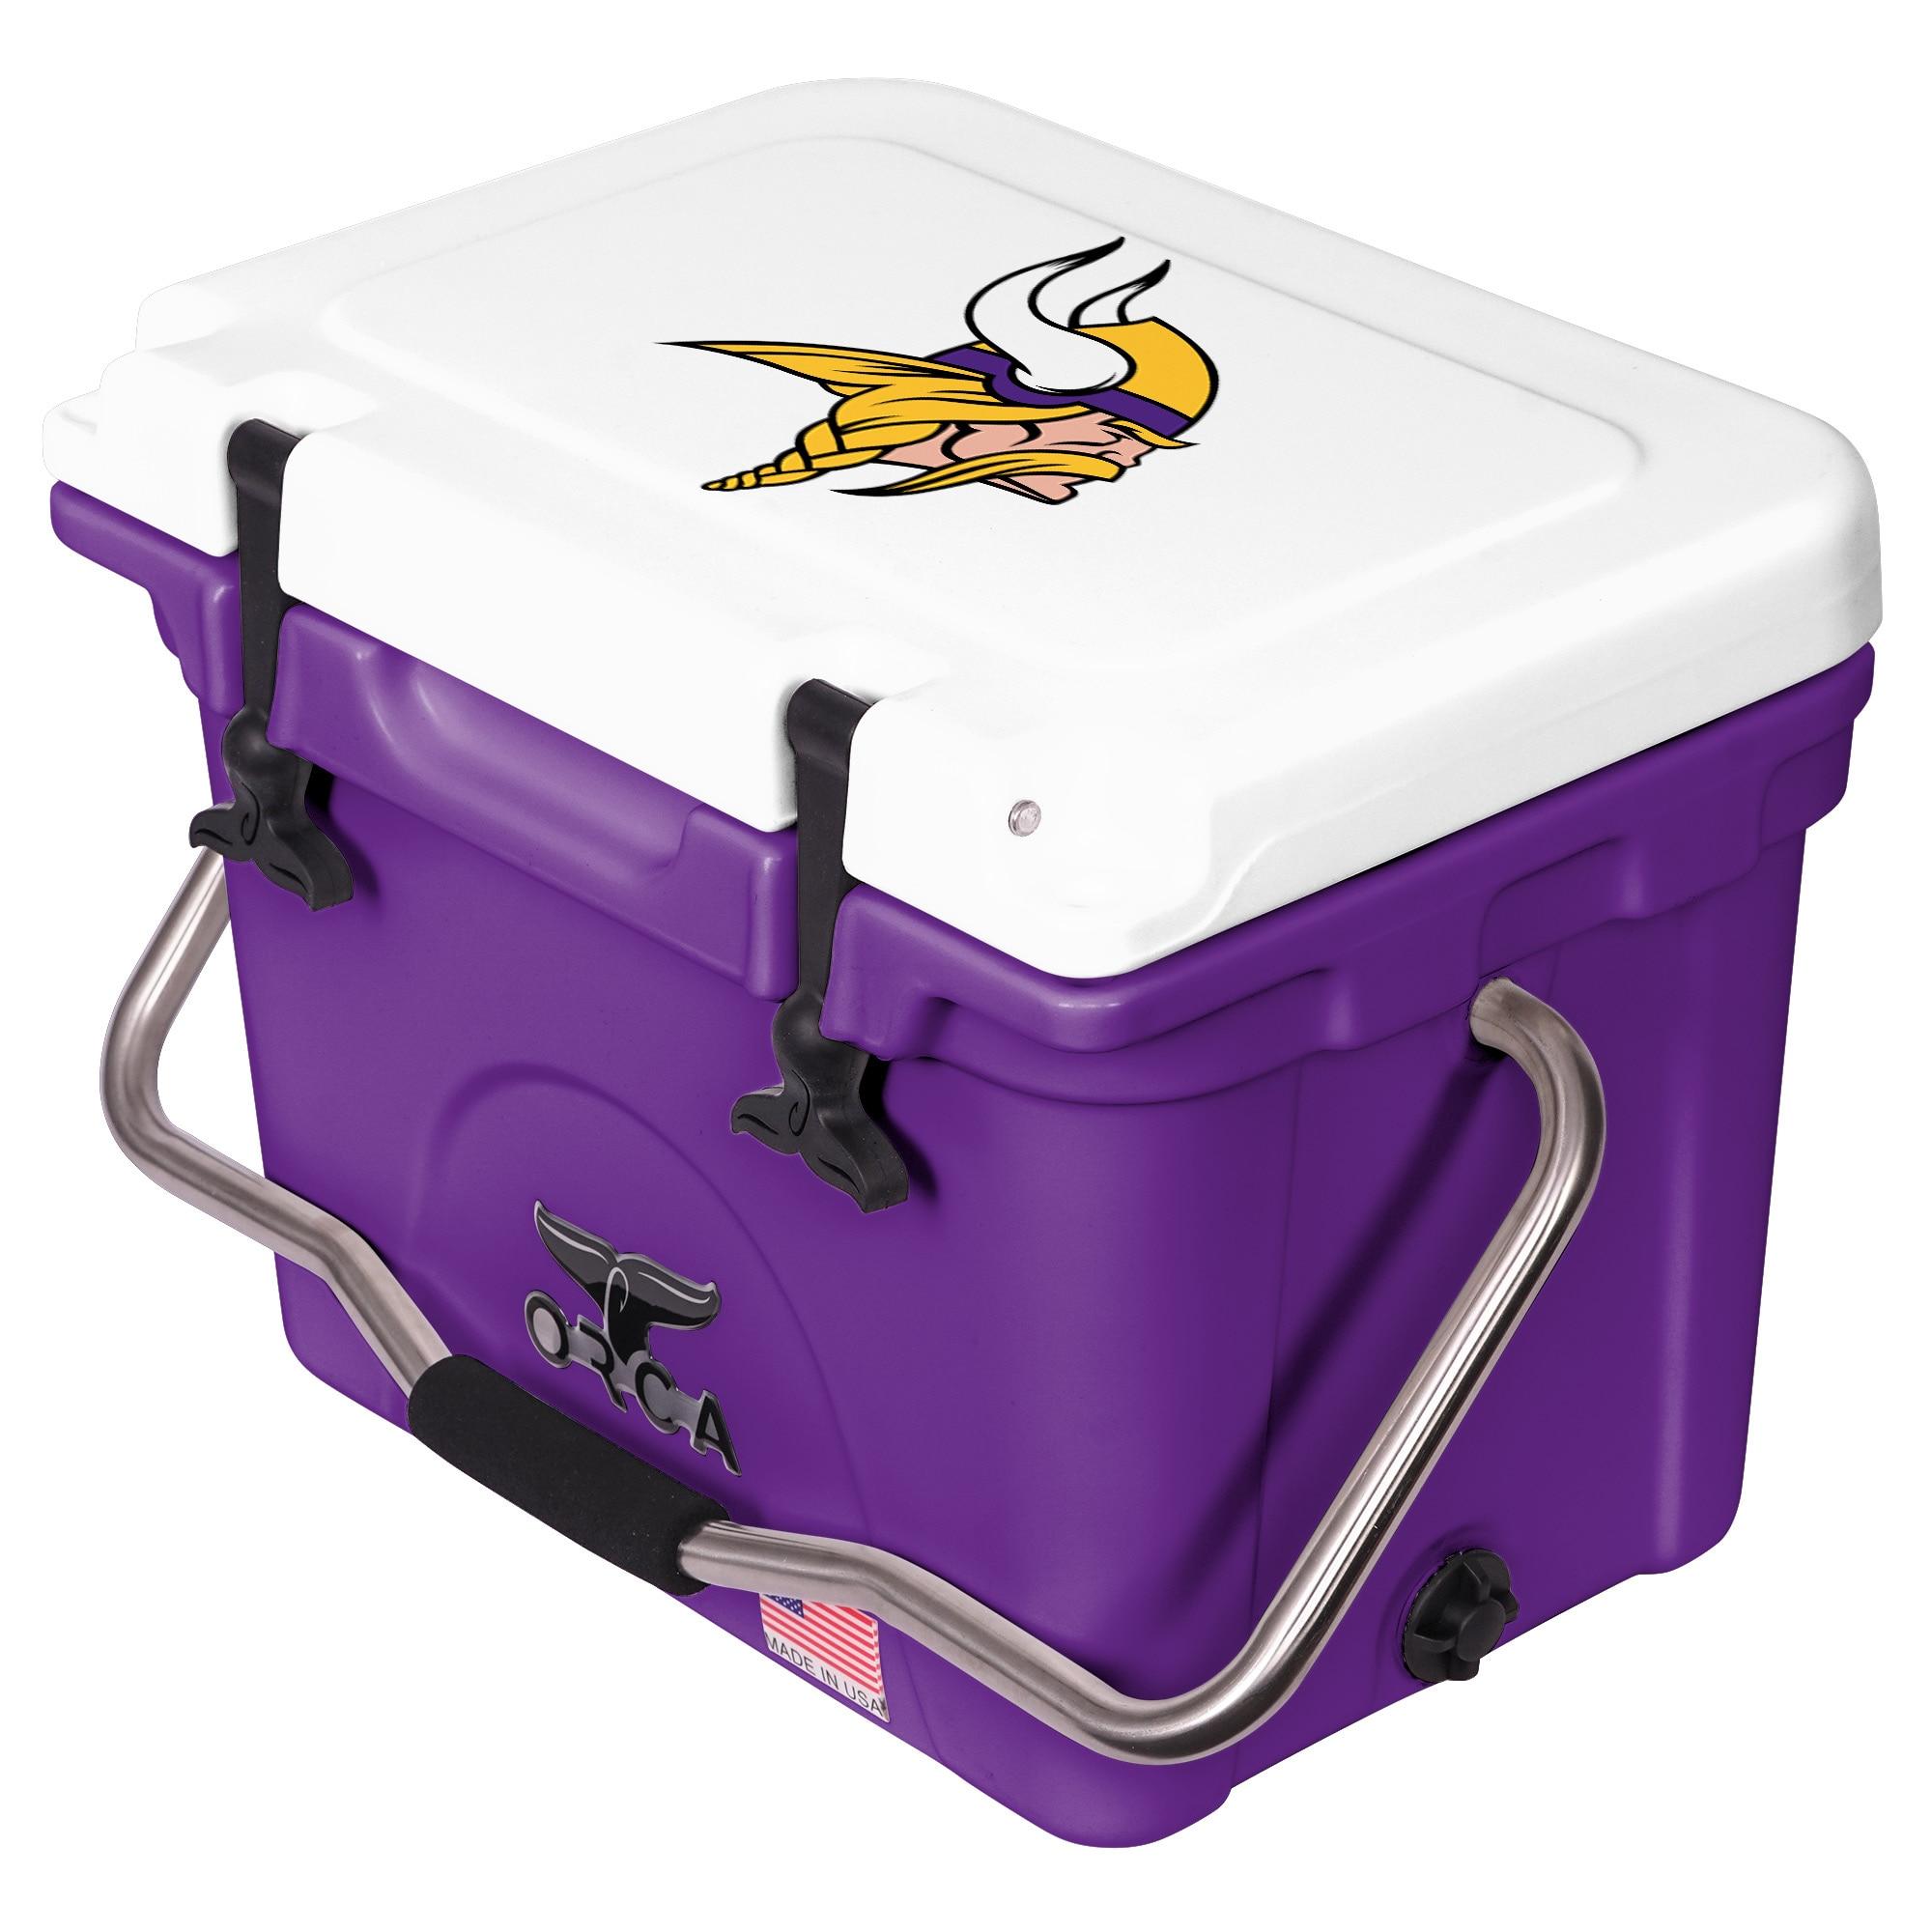 Minnesota Vikings ORCA 20-Quart Hard-Sided Cooler - Purple/White